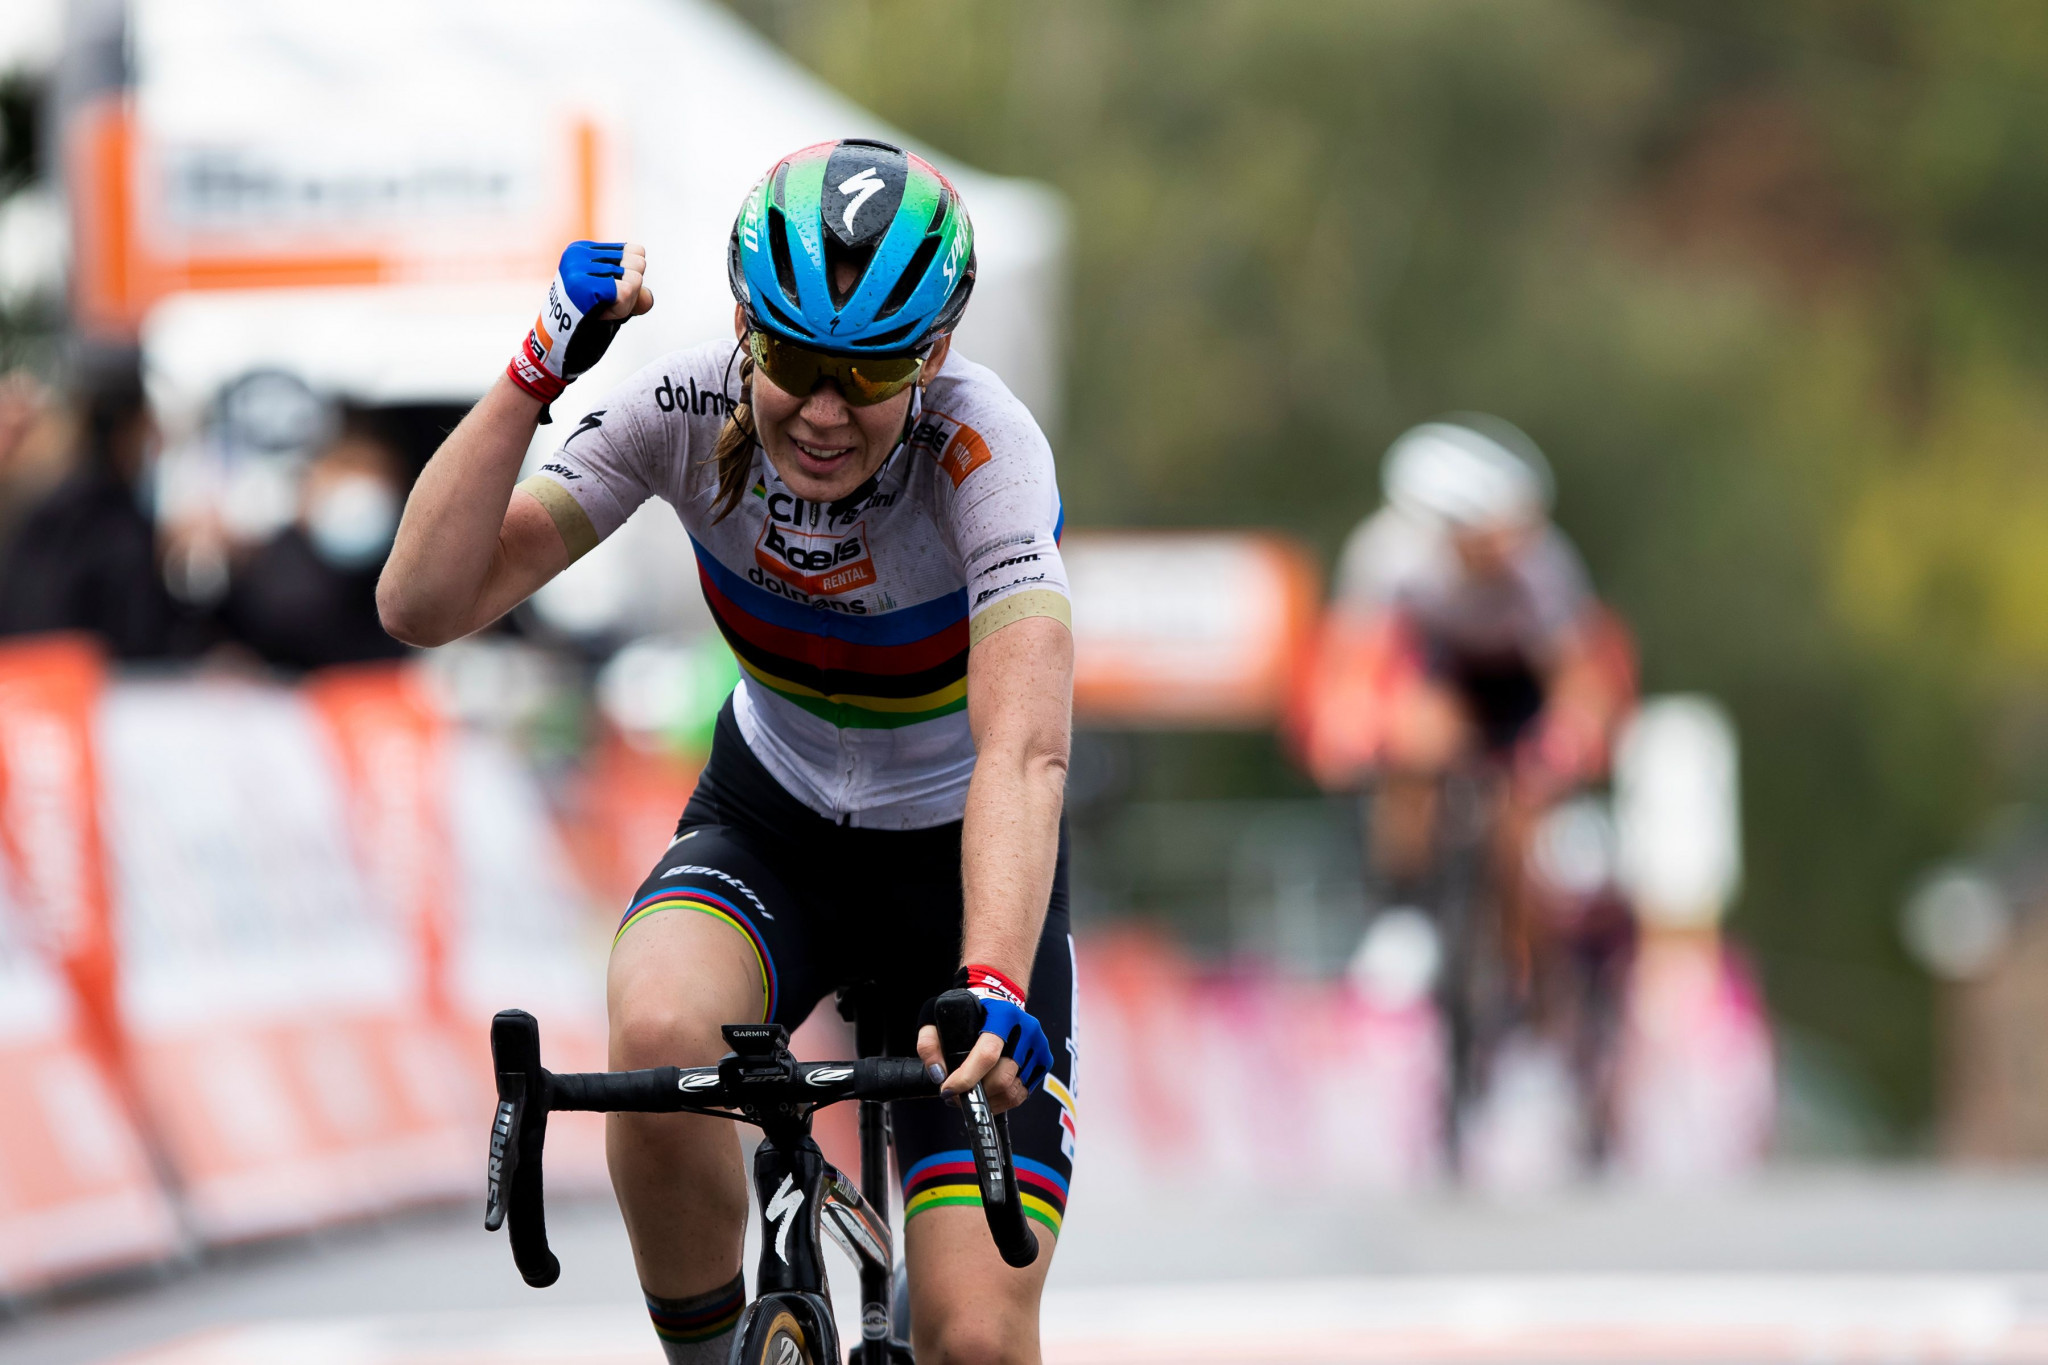 Van der Breggen wins sixth consecutive La Flèche Wallonne title